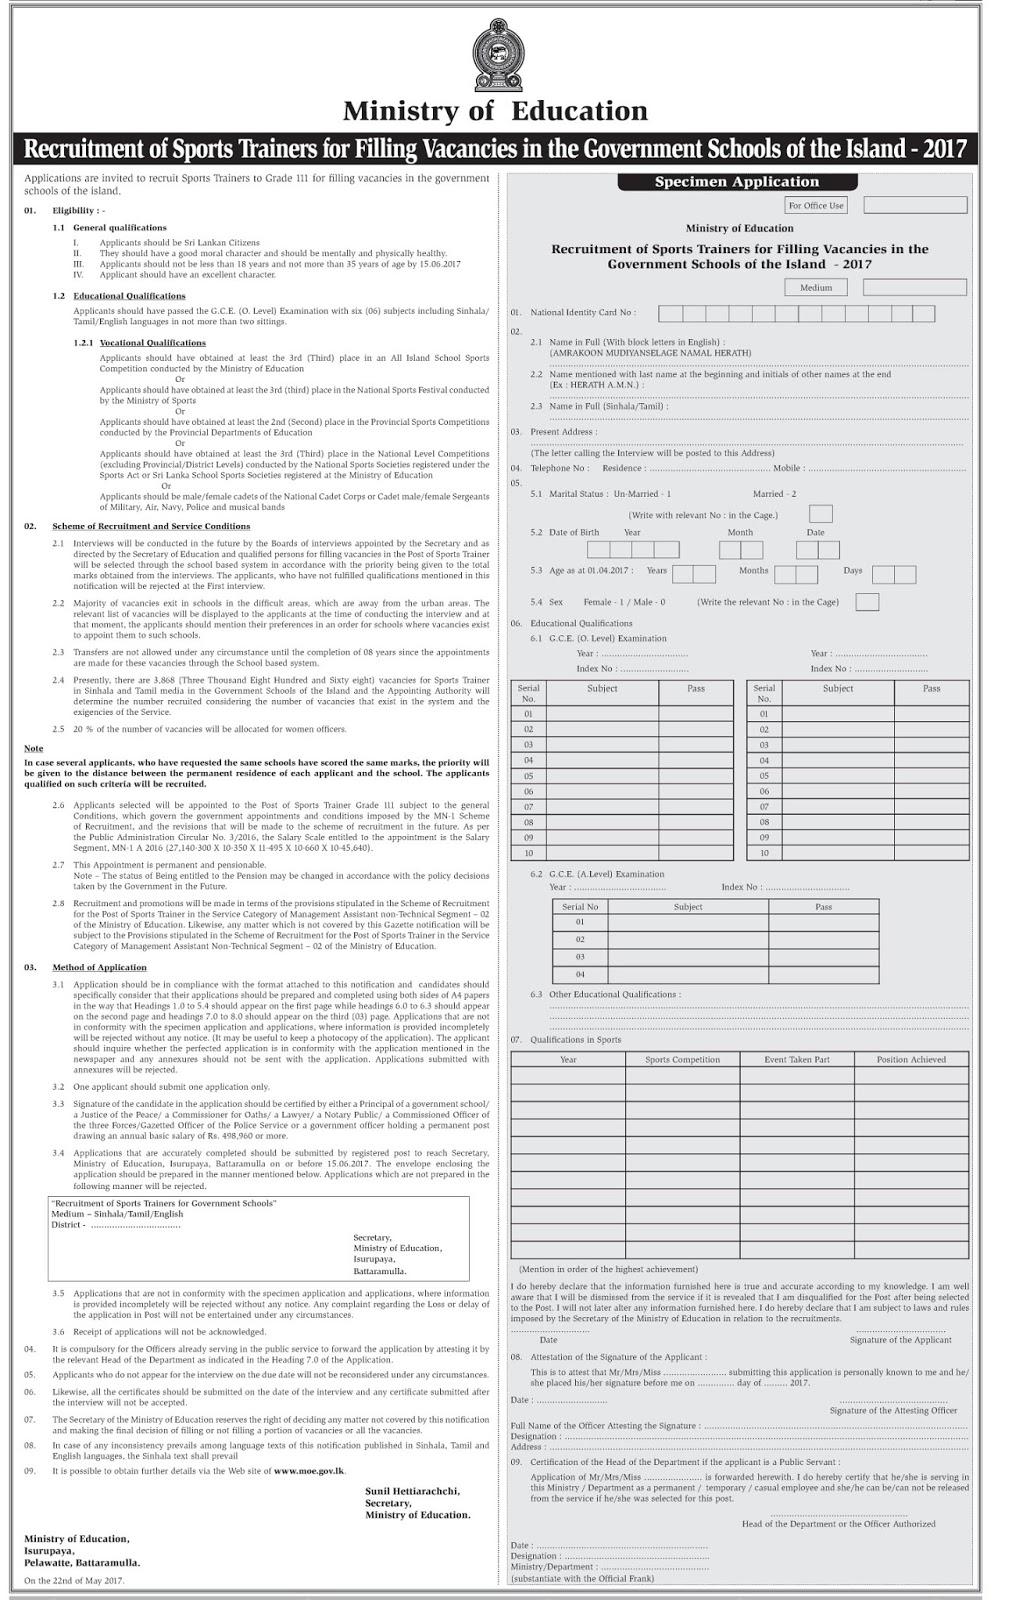 Ministry Of Education vacancy- Sports Trainee - JUNIOR LANKA